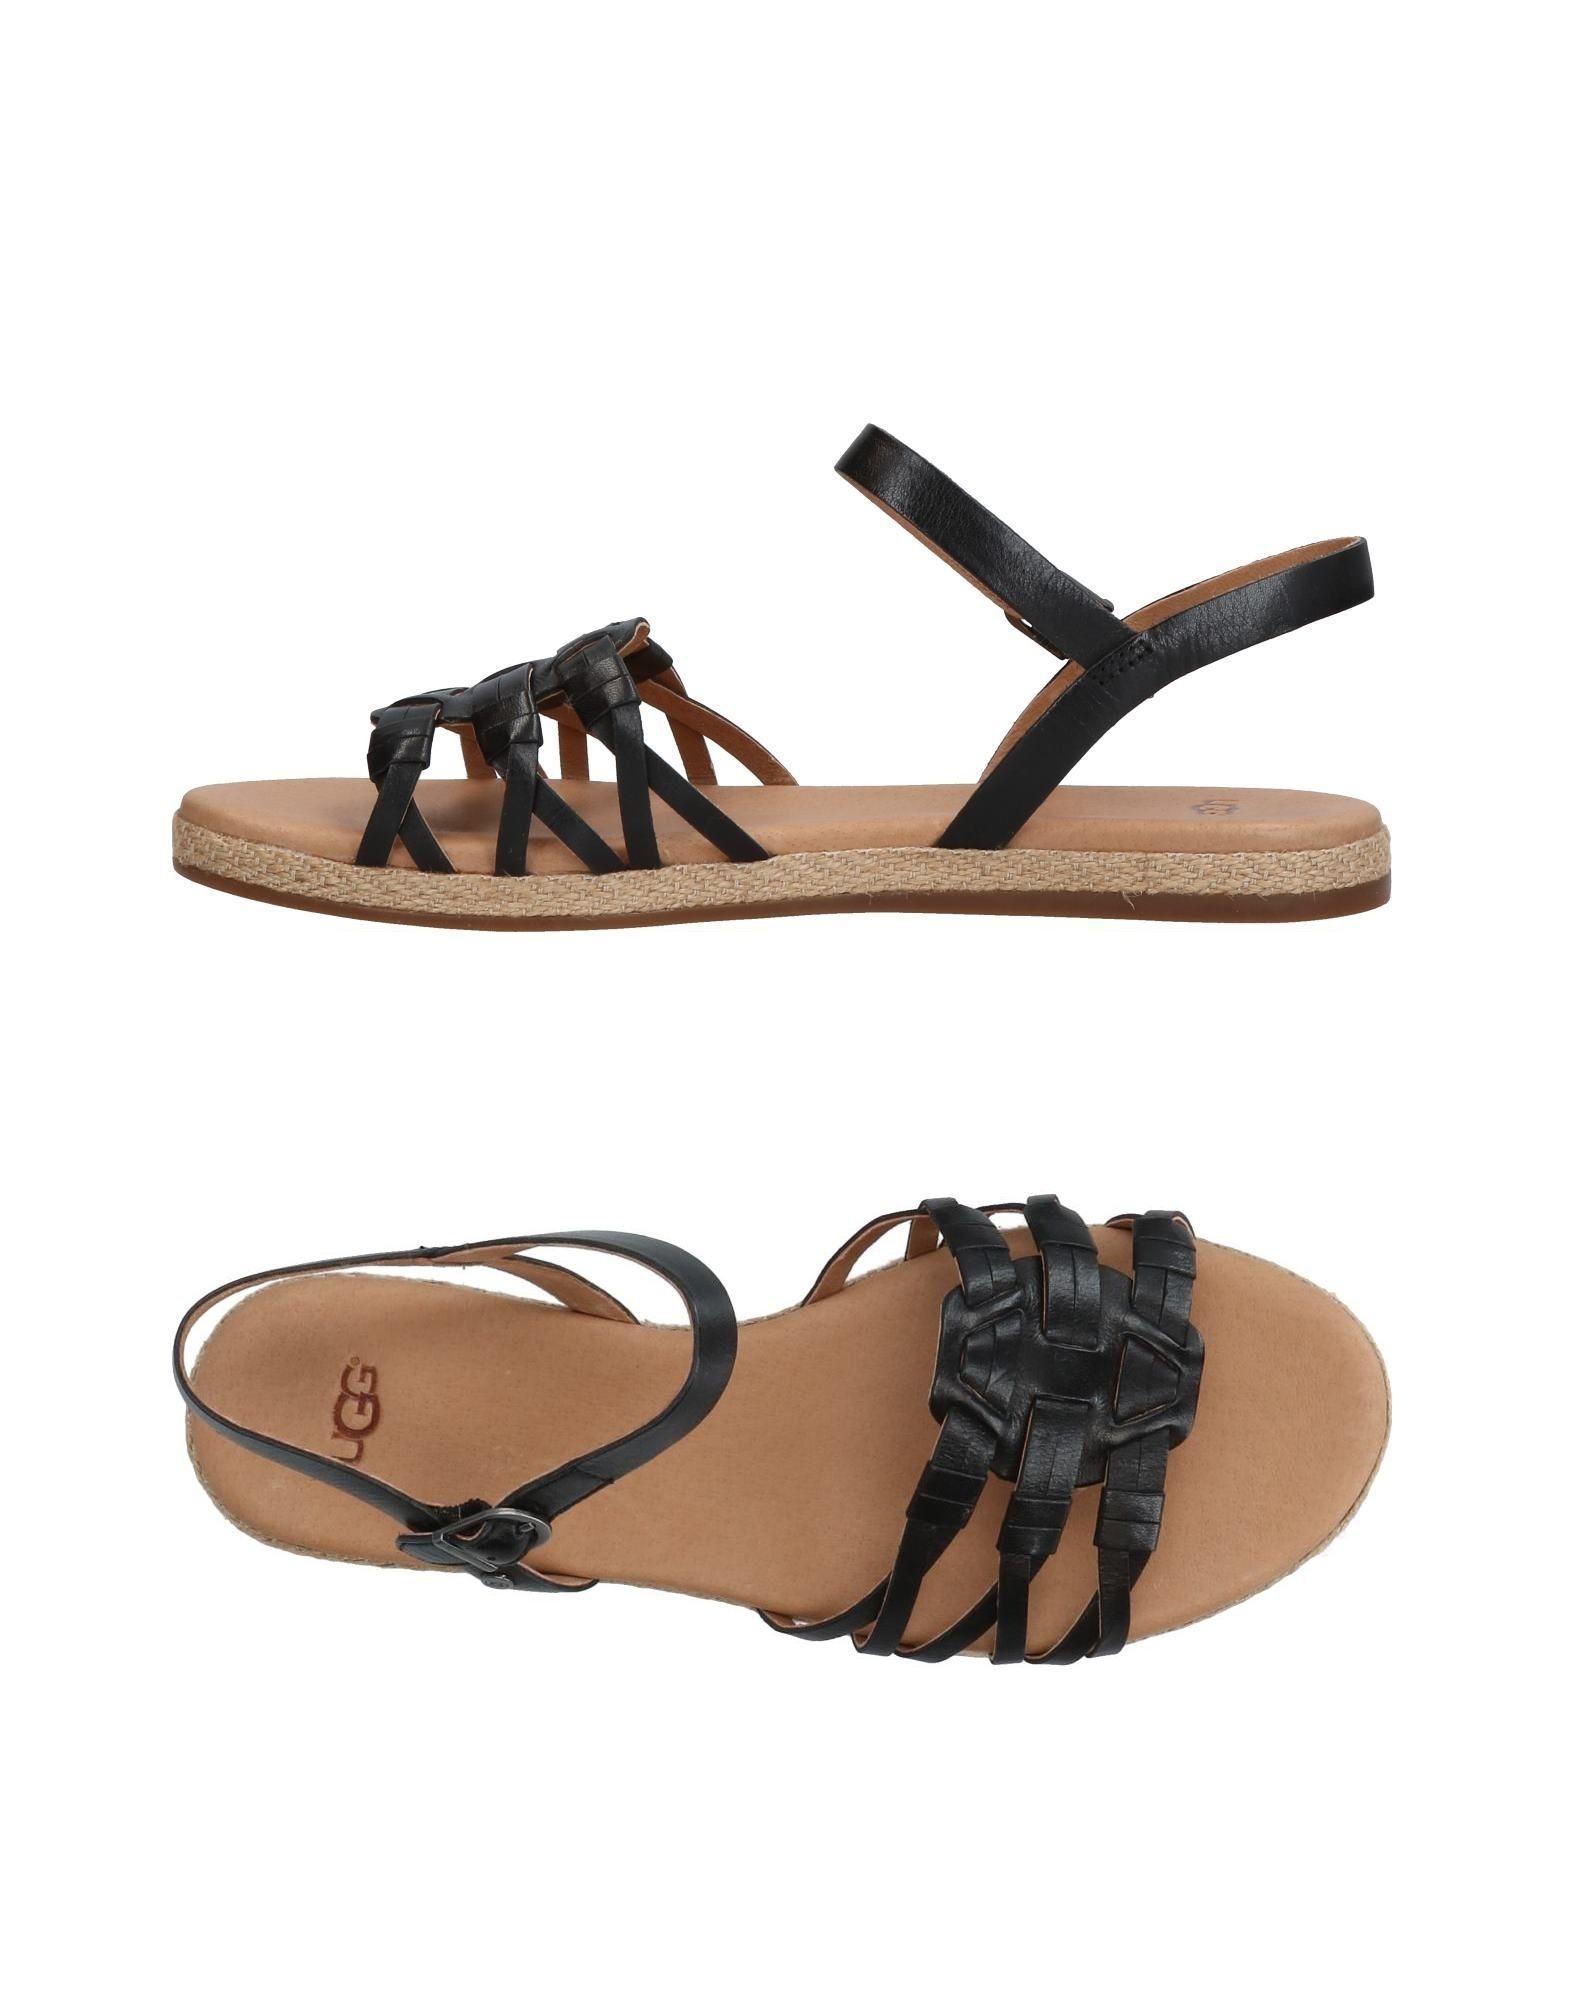 Ugg Australia Black Leather Sandals